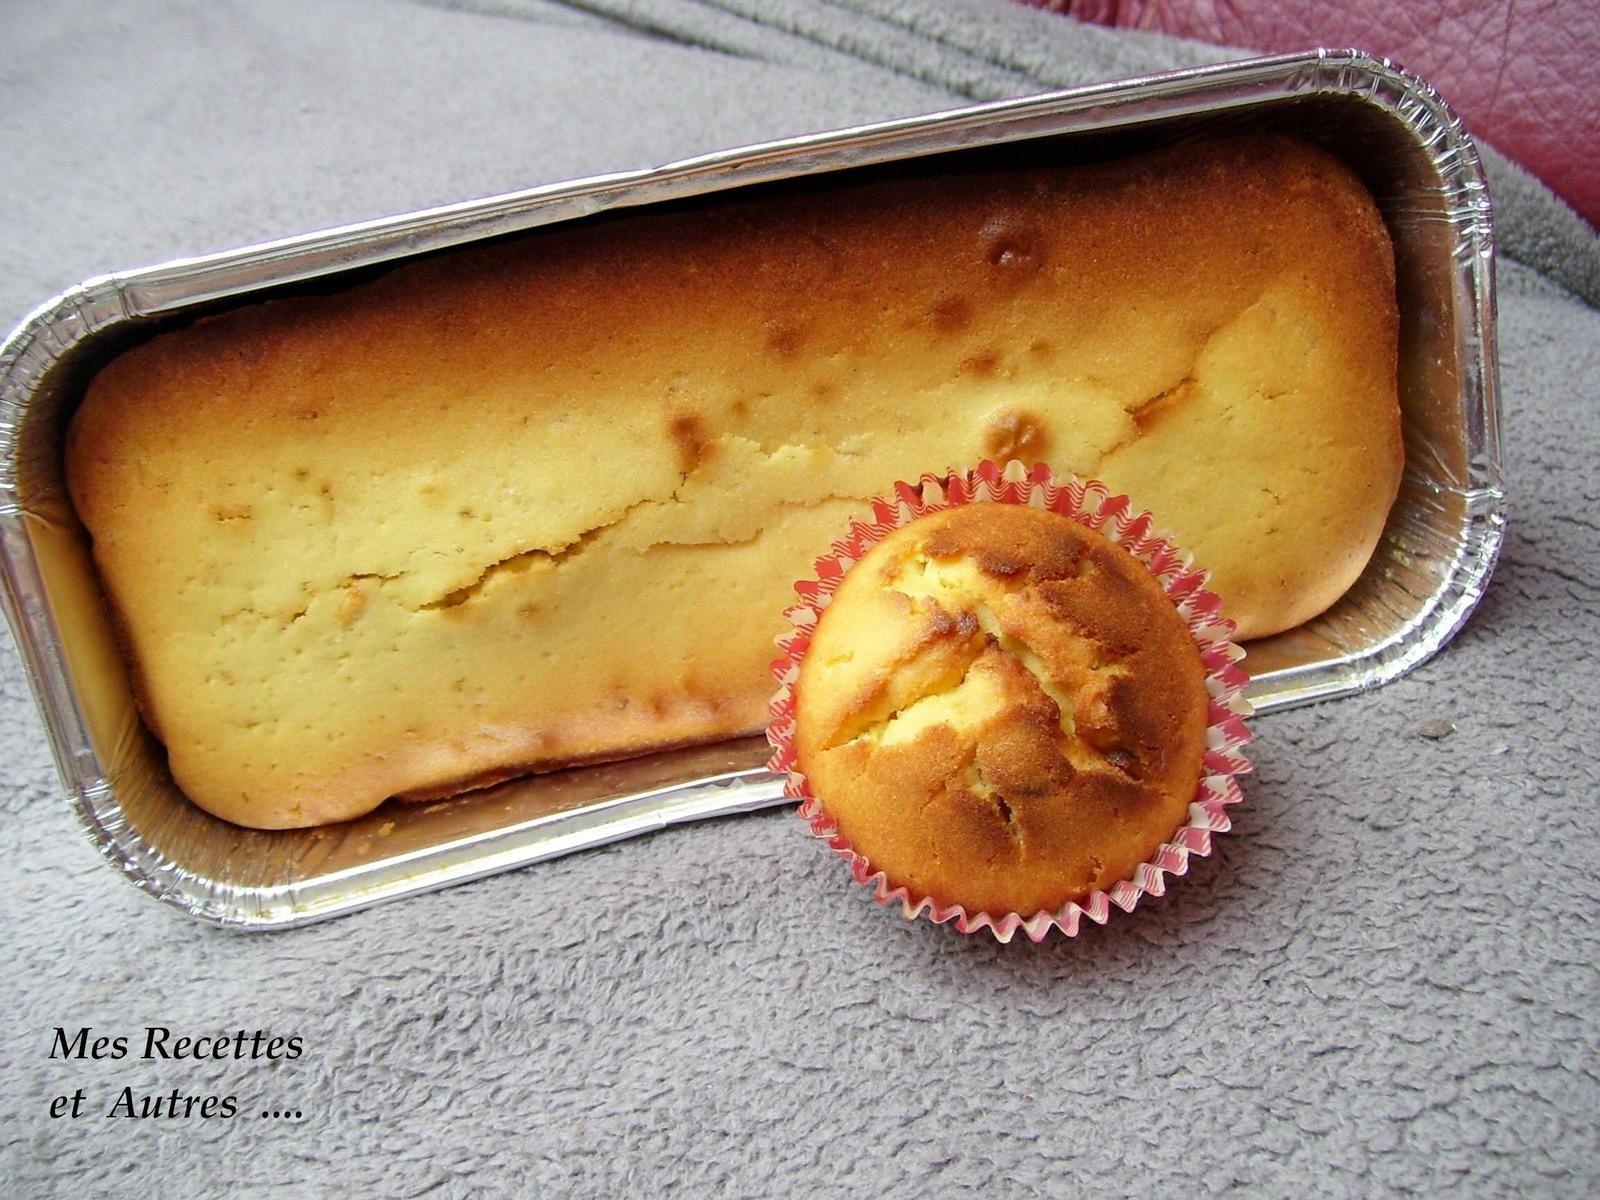 Cake au Citron comme une Madeleine...